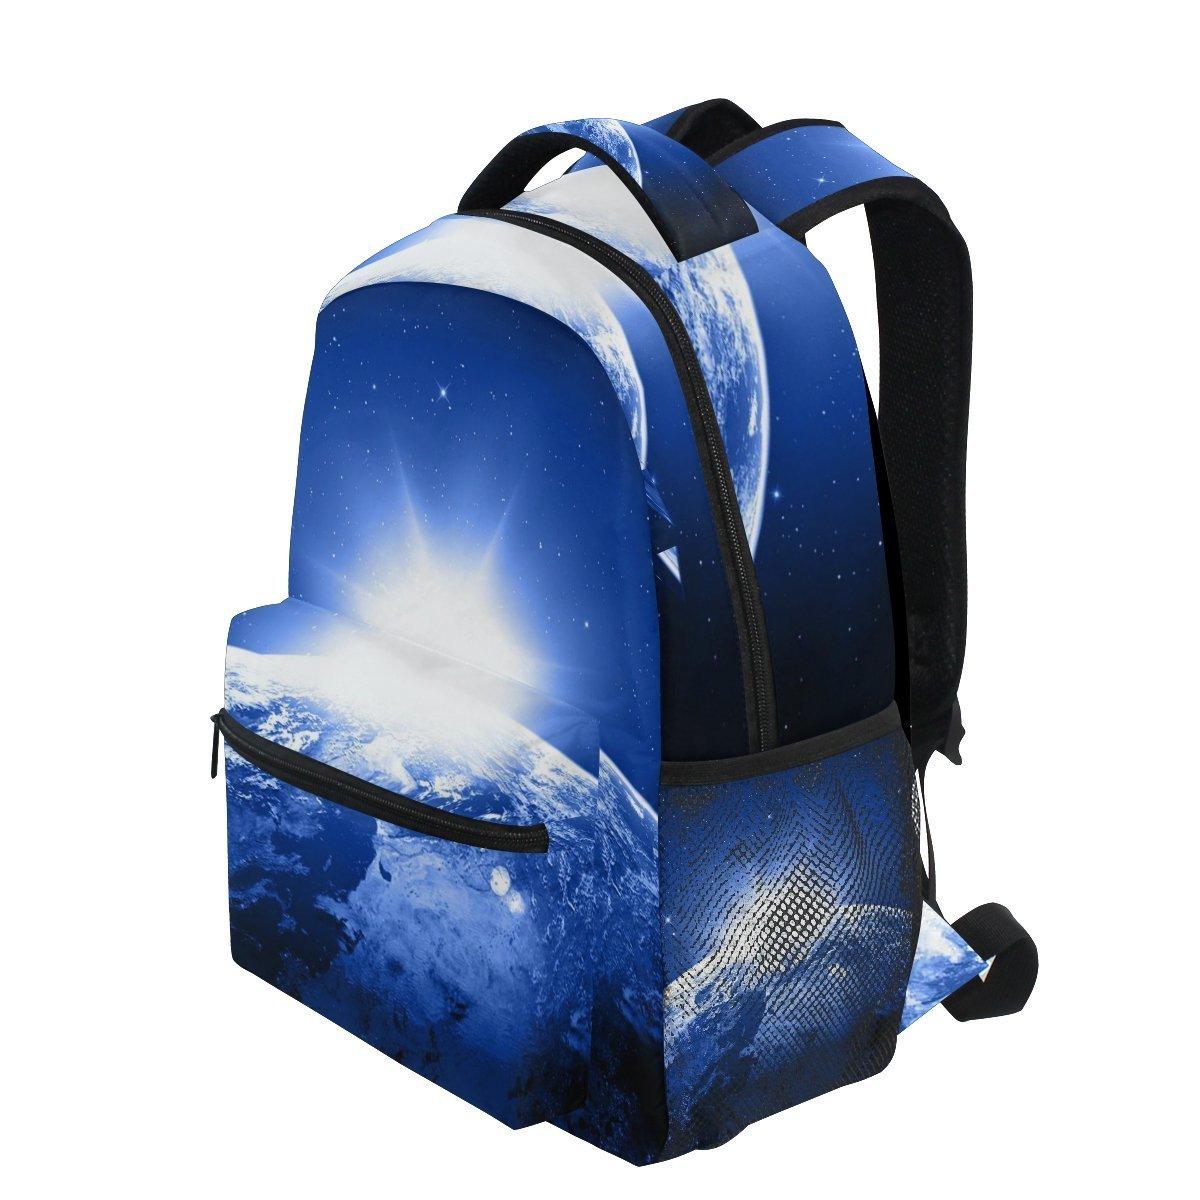 AHOMY ガールズ スクールバックパック ギャラクシー 星 宇宙 大学 ブックバッグ レディ 旅行 リュックサック   B07G48DJSB